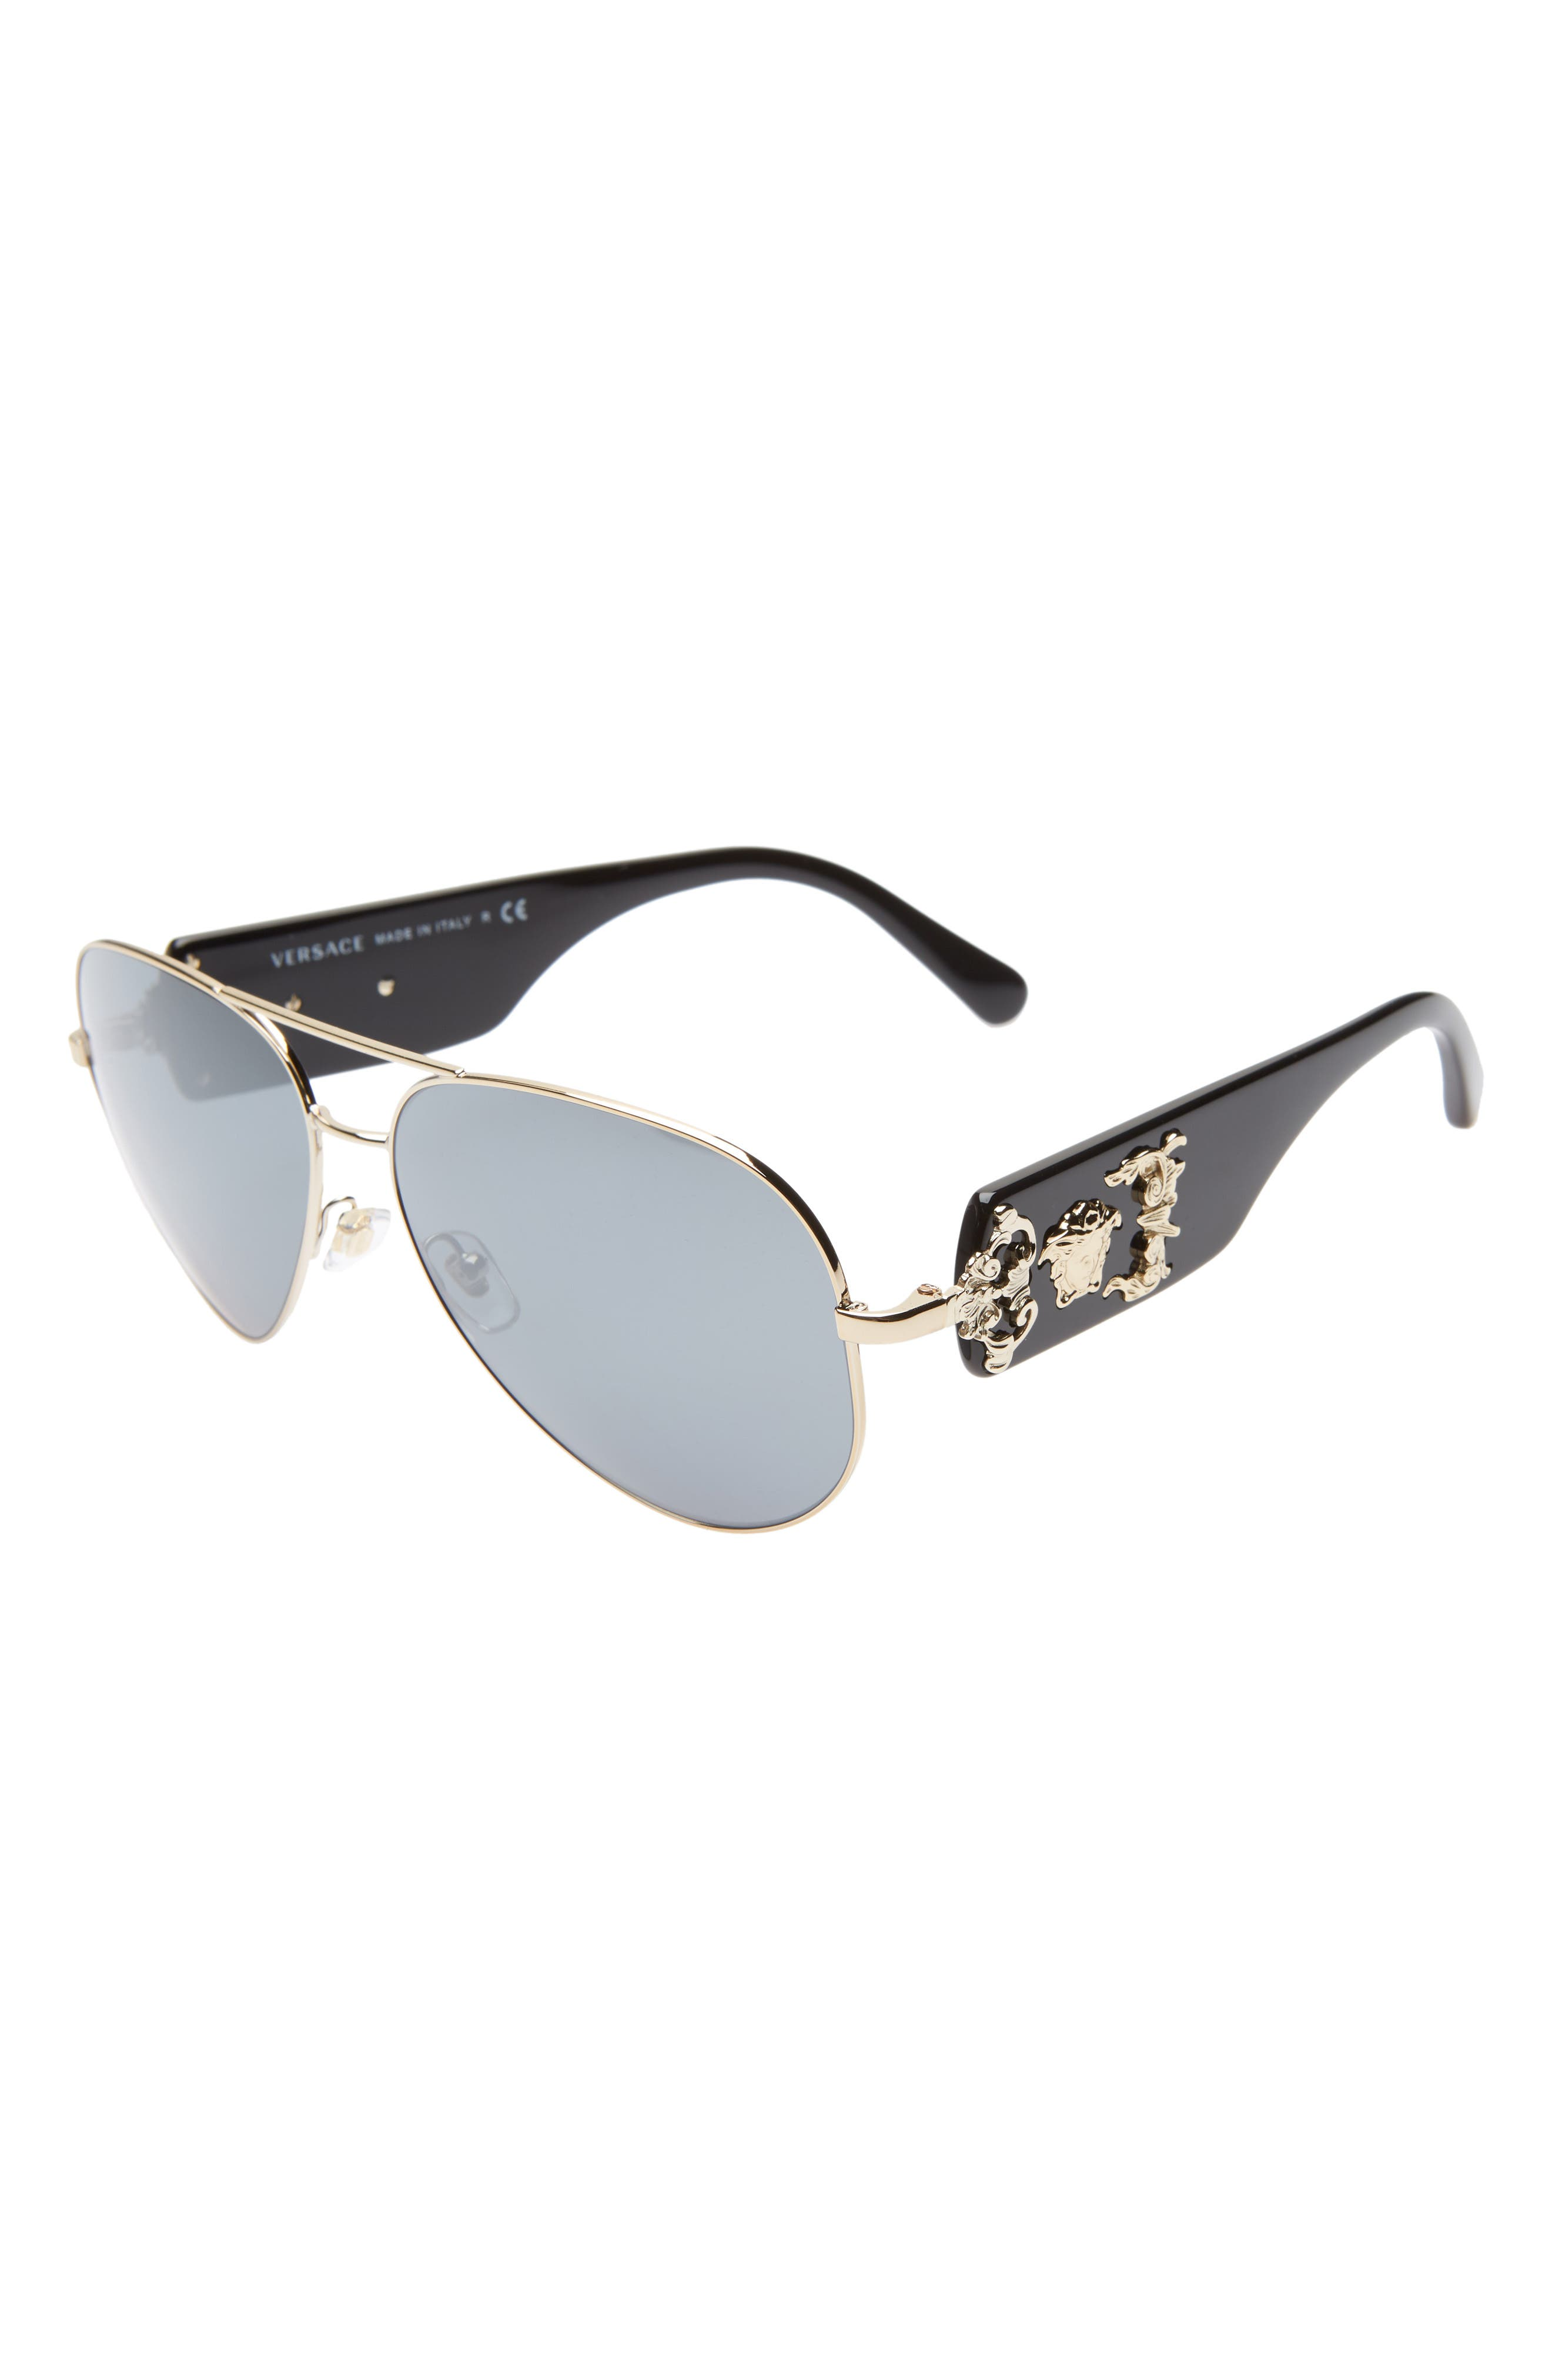 VERSACE,                             62mm Aviator Sunglasses,                             Alternate thumbnail 3, color,                             GOLD/ BLACK